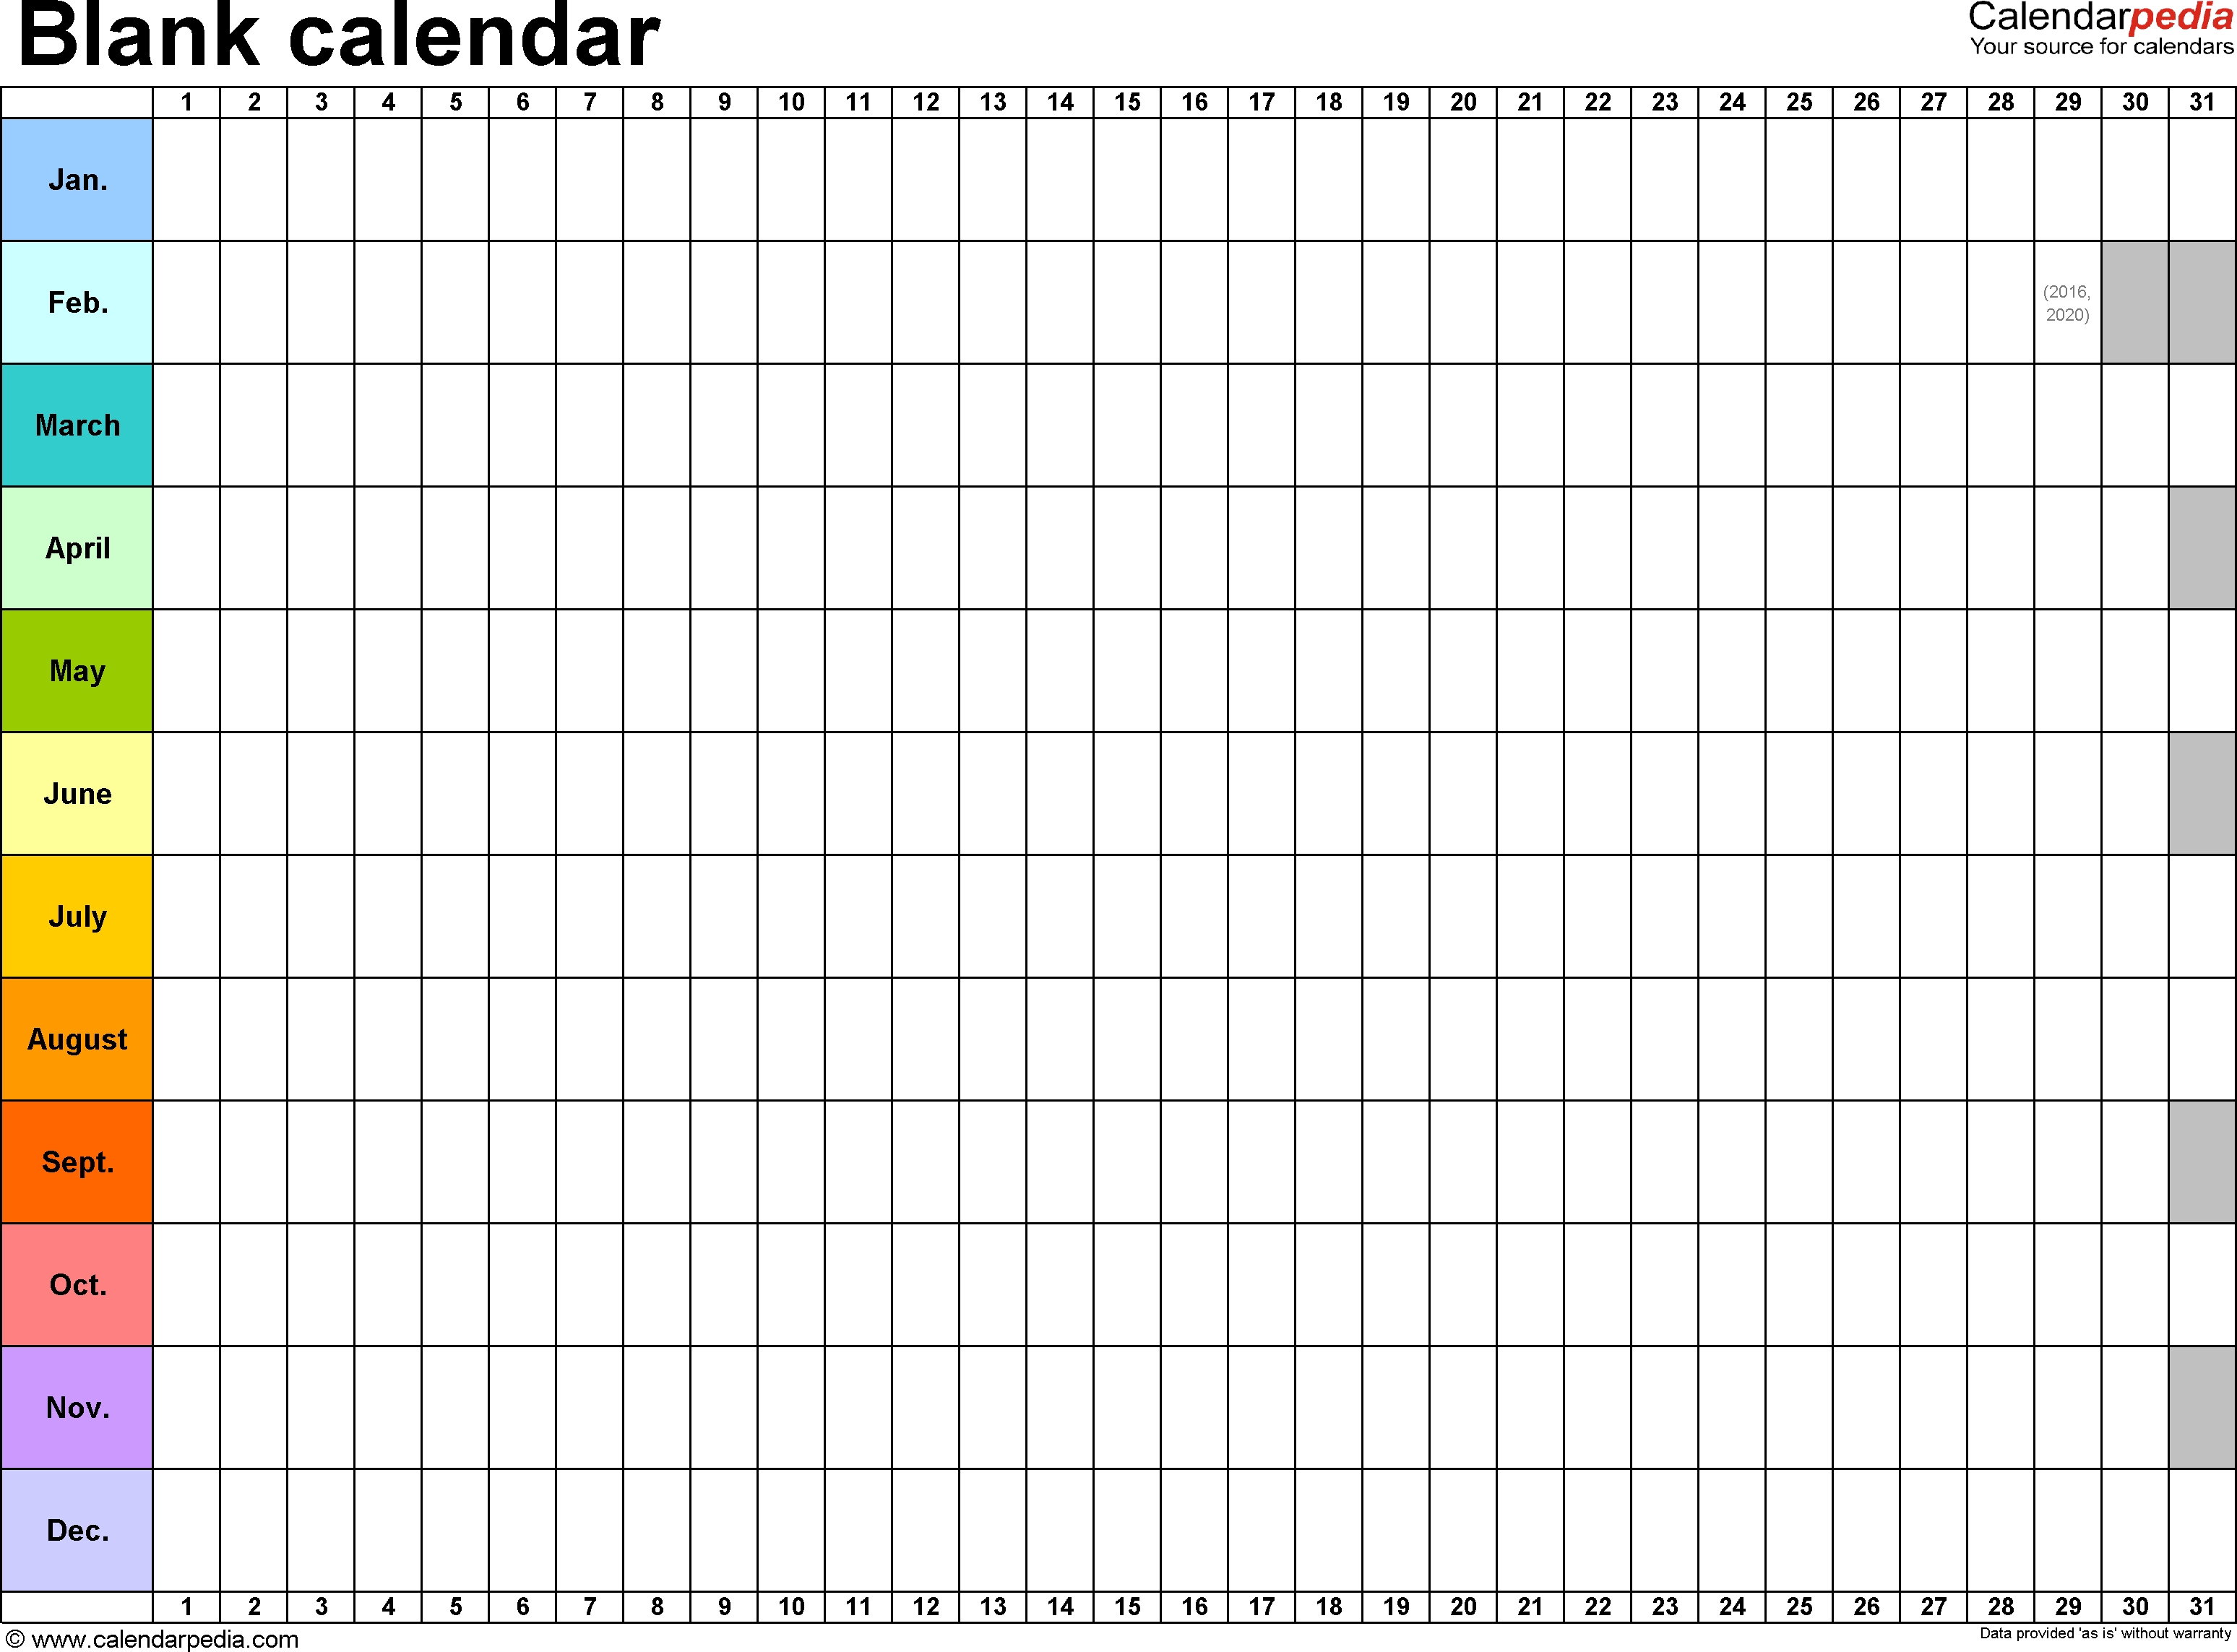 Blank Calendar - 9 Free Printable Microsoft Word Templates throughout Printable Blank 3 Month Calendar